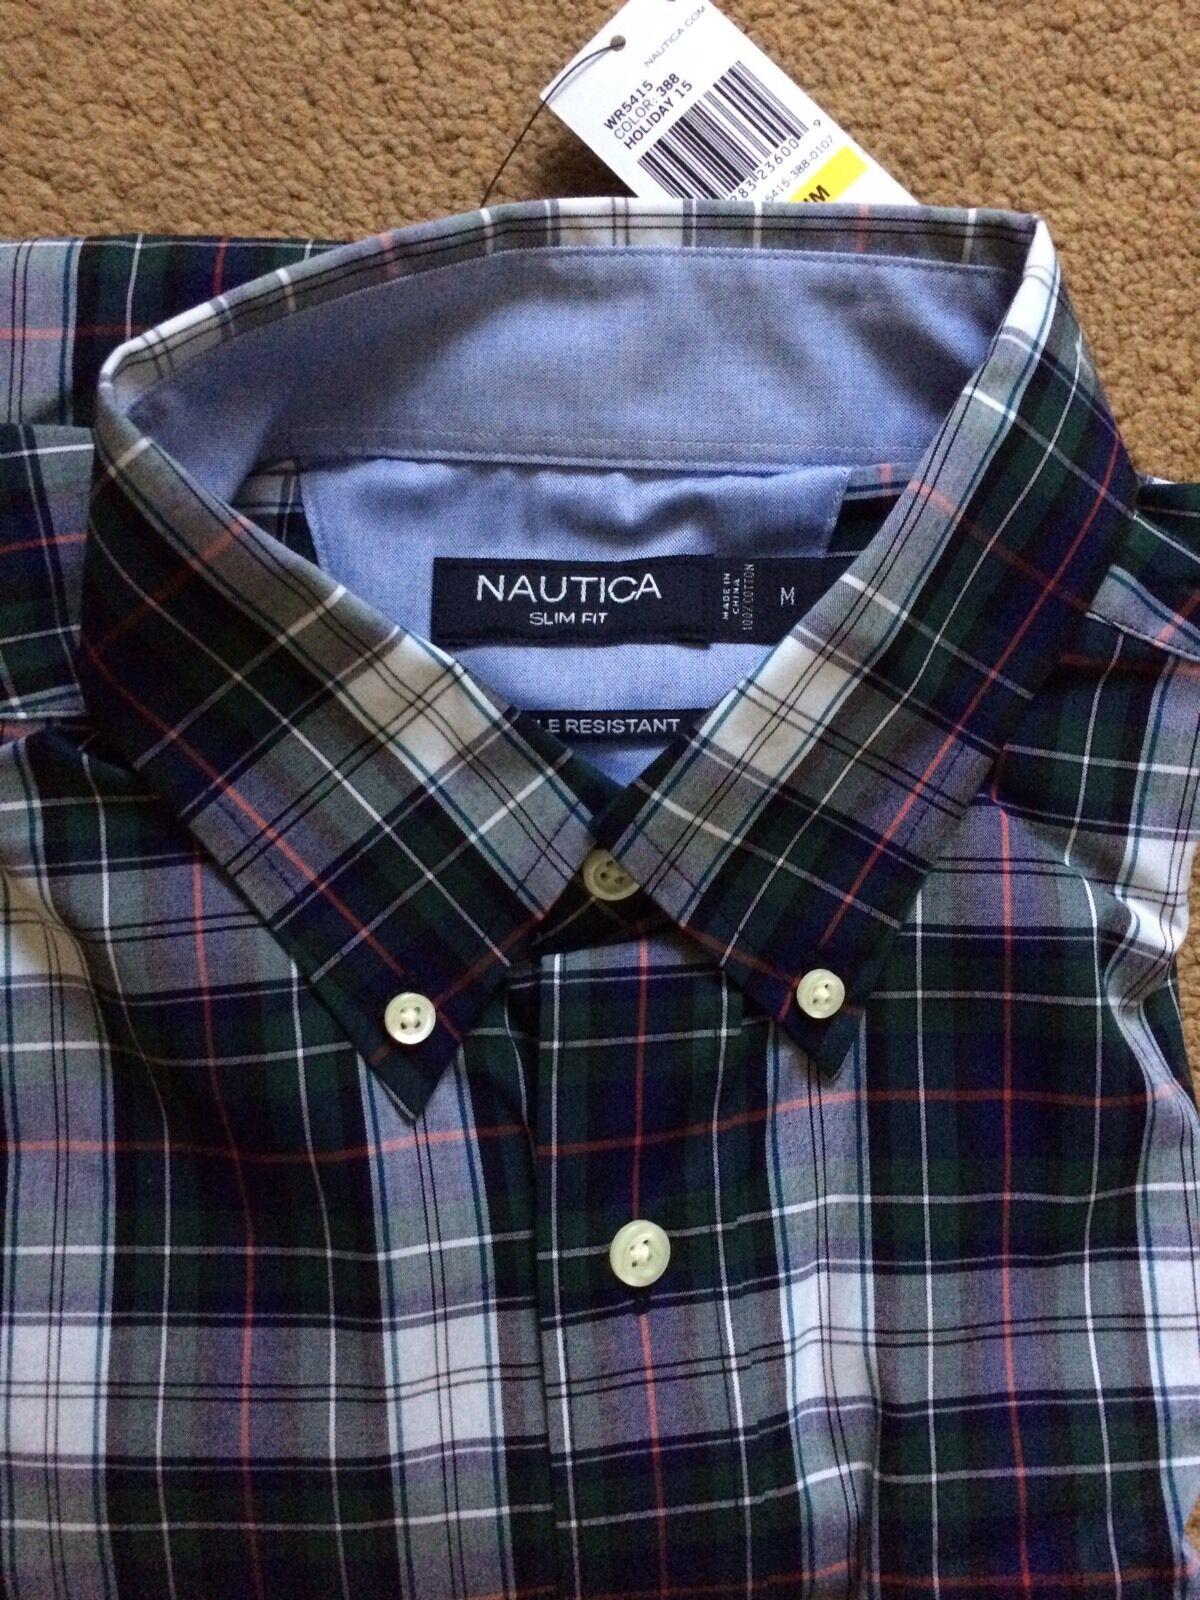 NAUTICA Wrinkle Resistant True Plaid Shirt, Slim Fit, Casual Formal, Size Medium